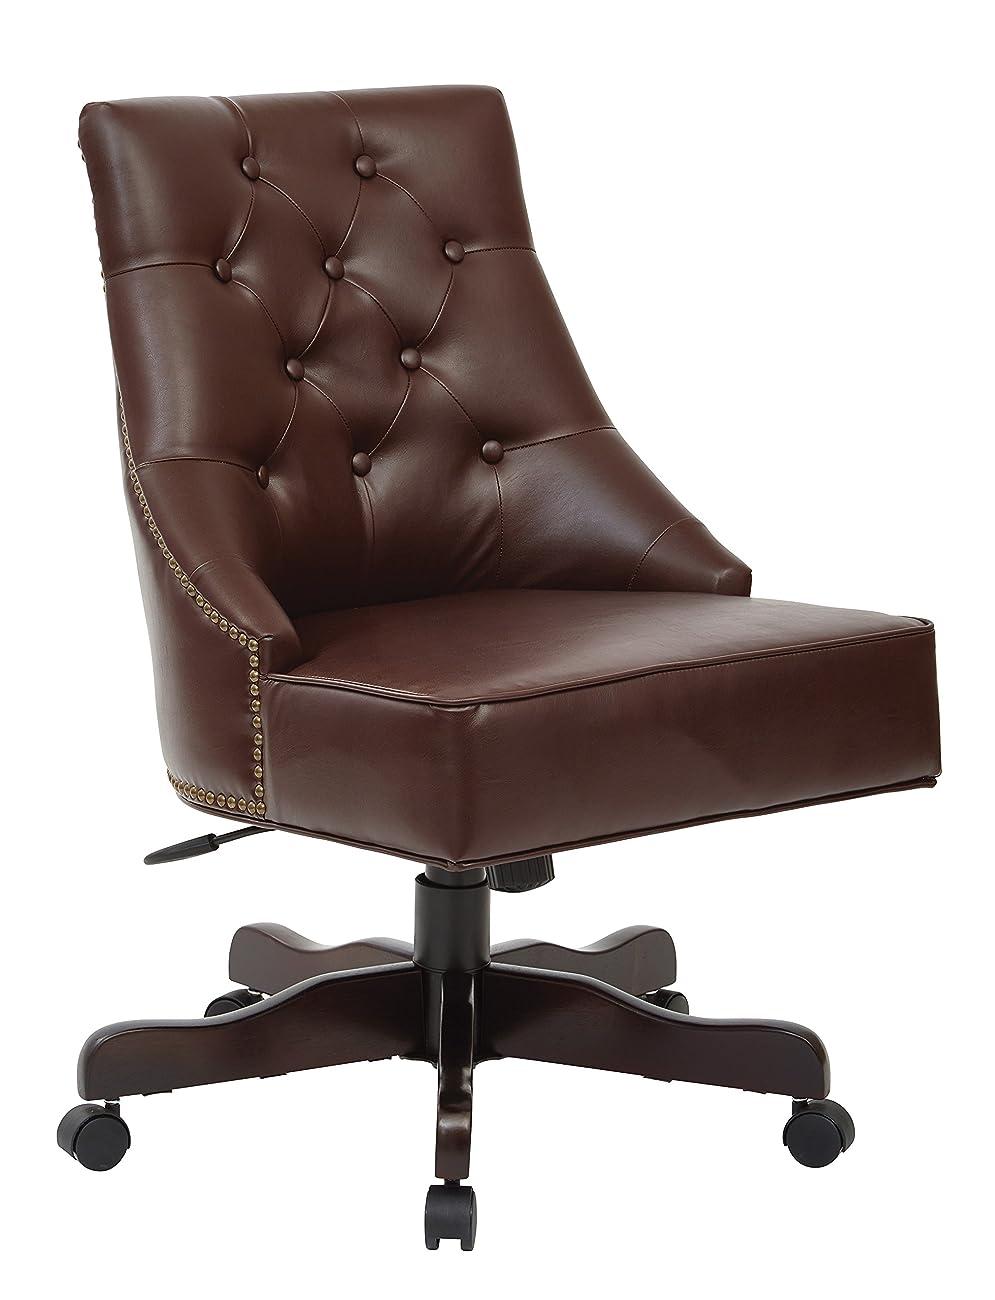 OFFICE STAR BP-REBEX-BD24 Rebecca Office Chair, Cocoa 0